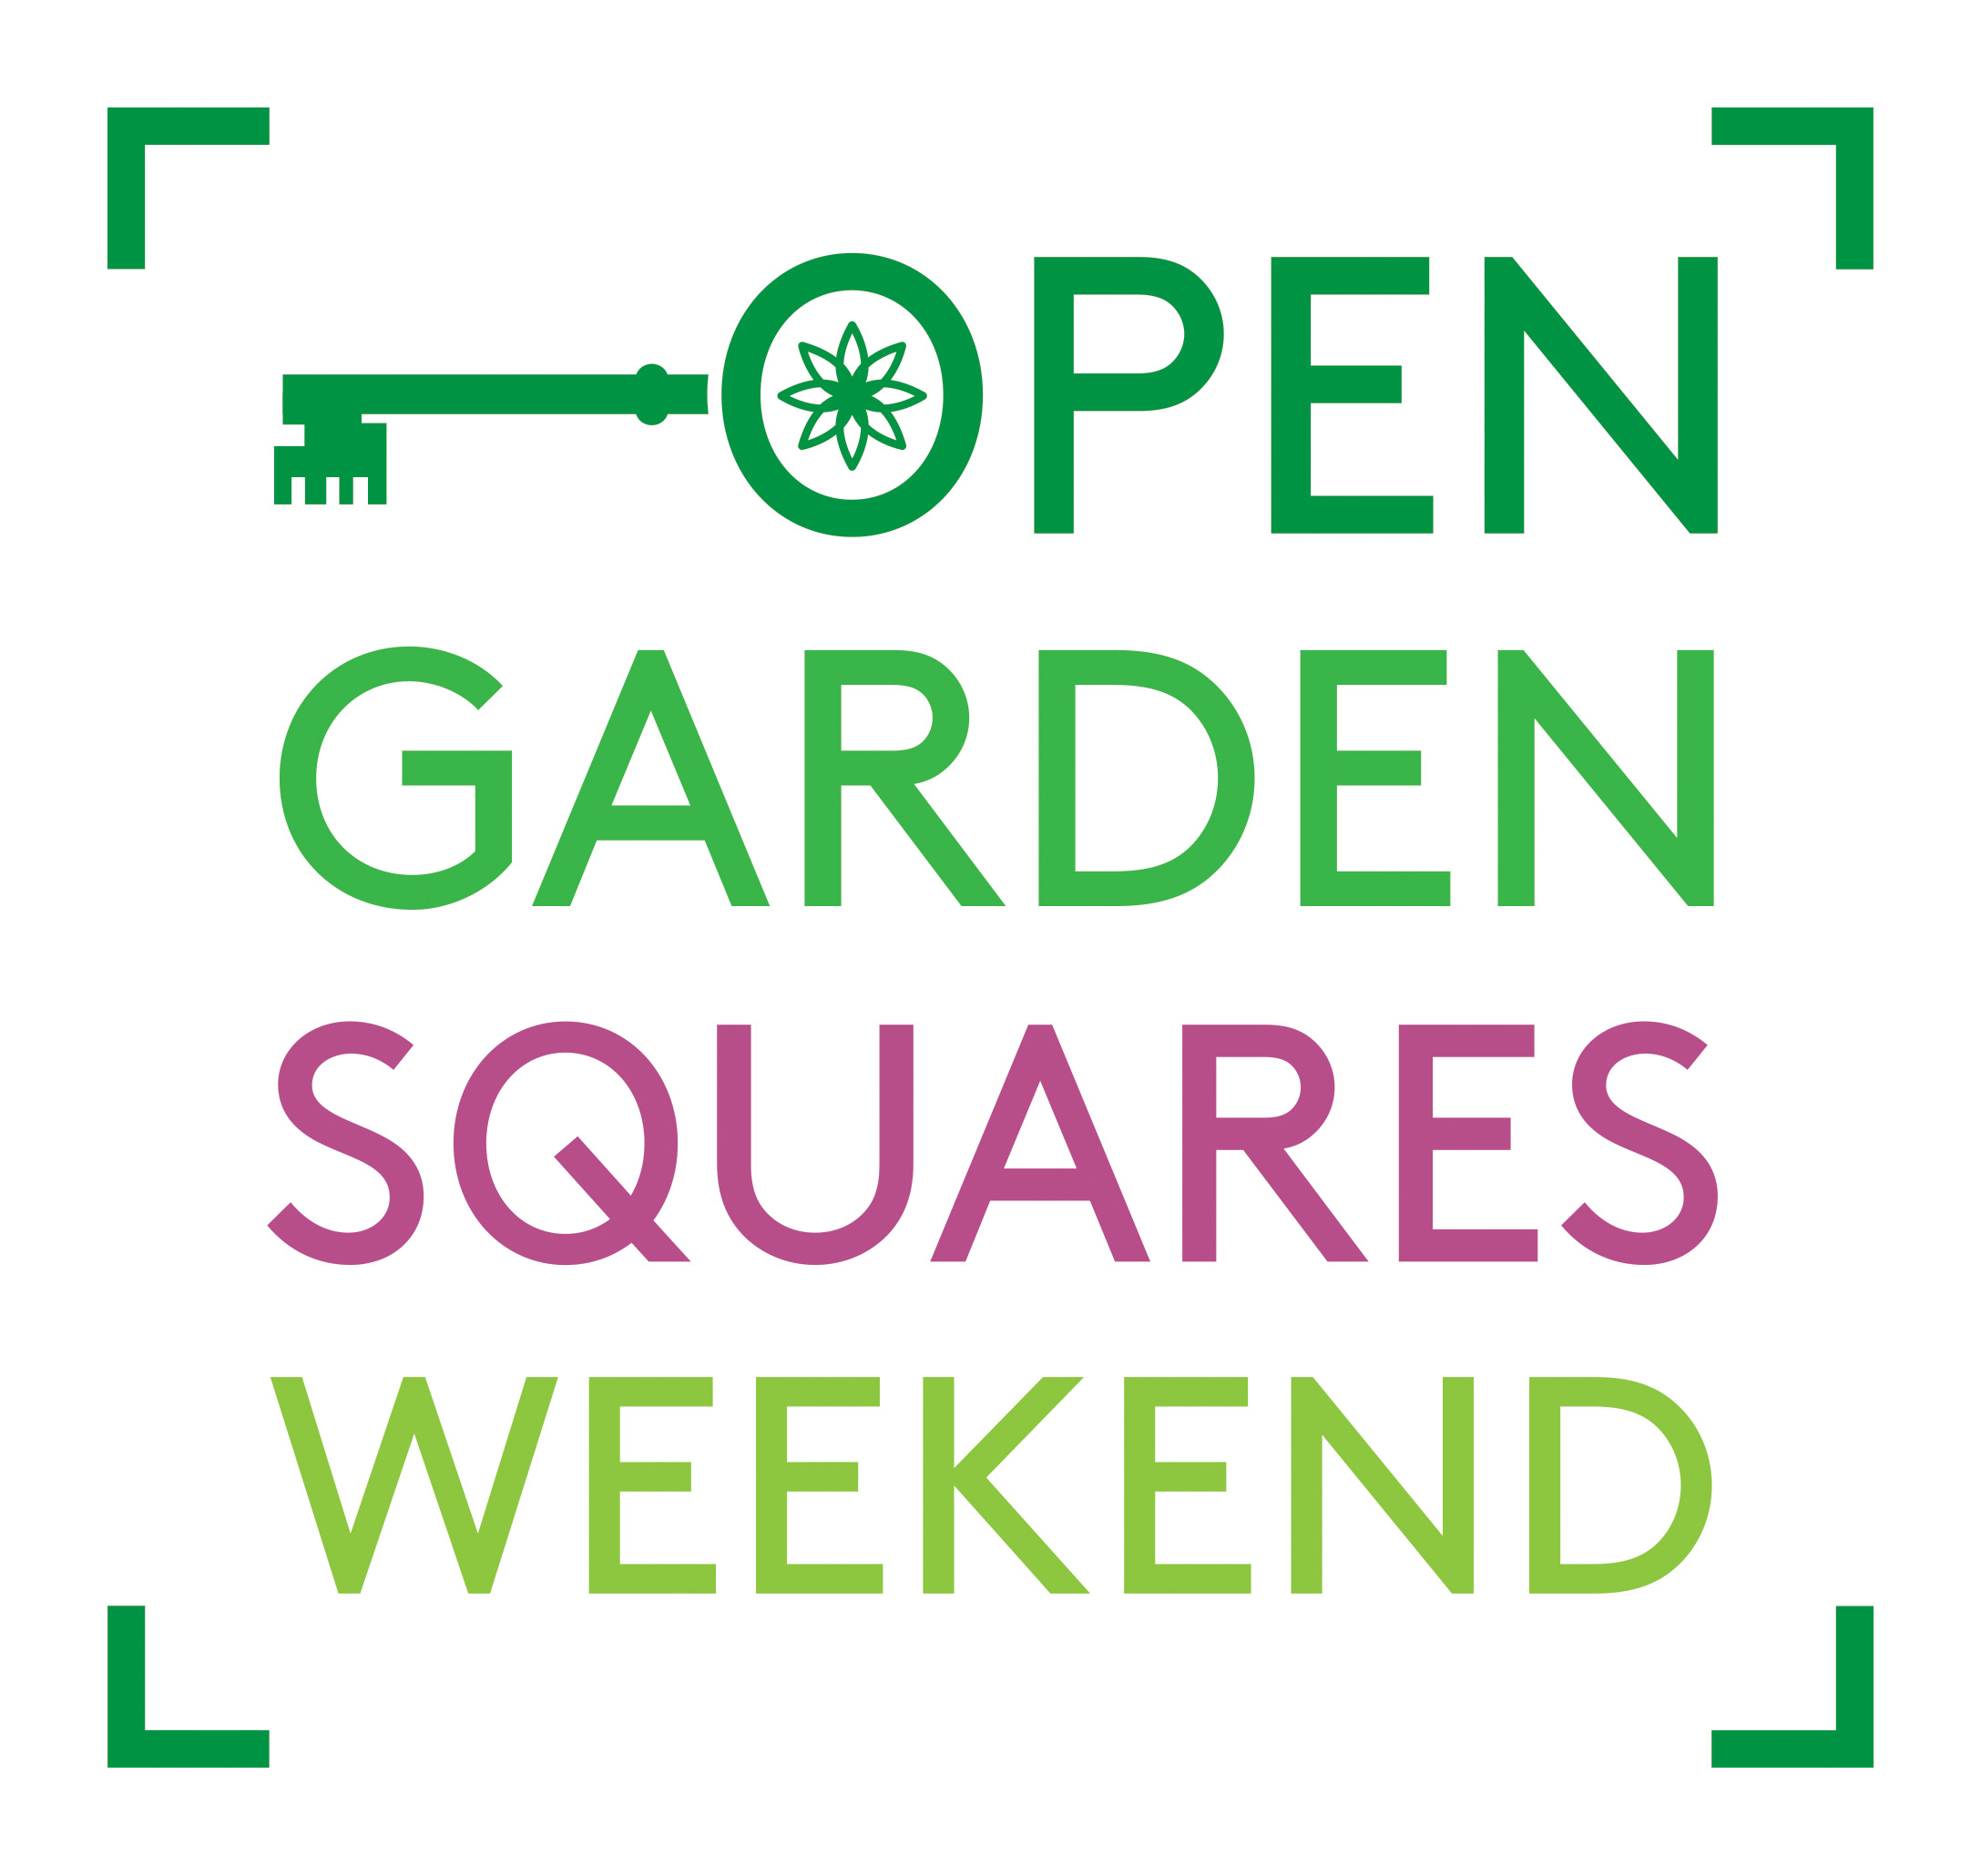 open garden squares weekend visitor feedback 2016